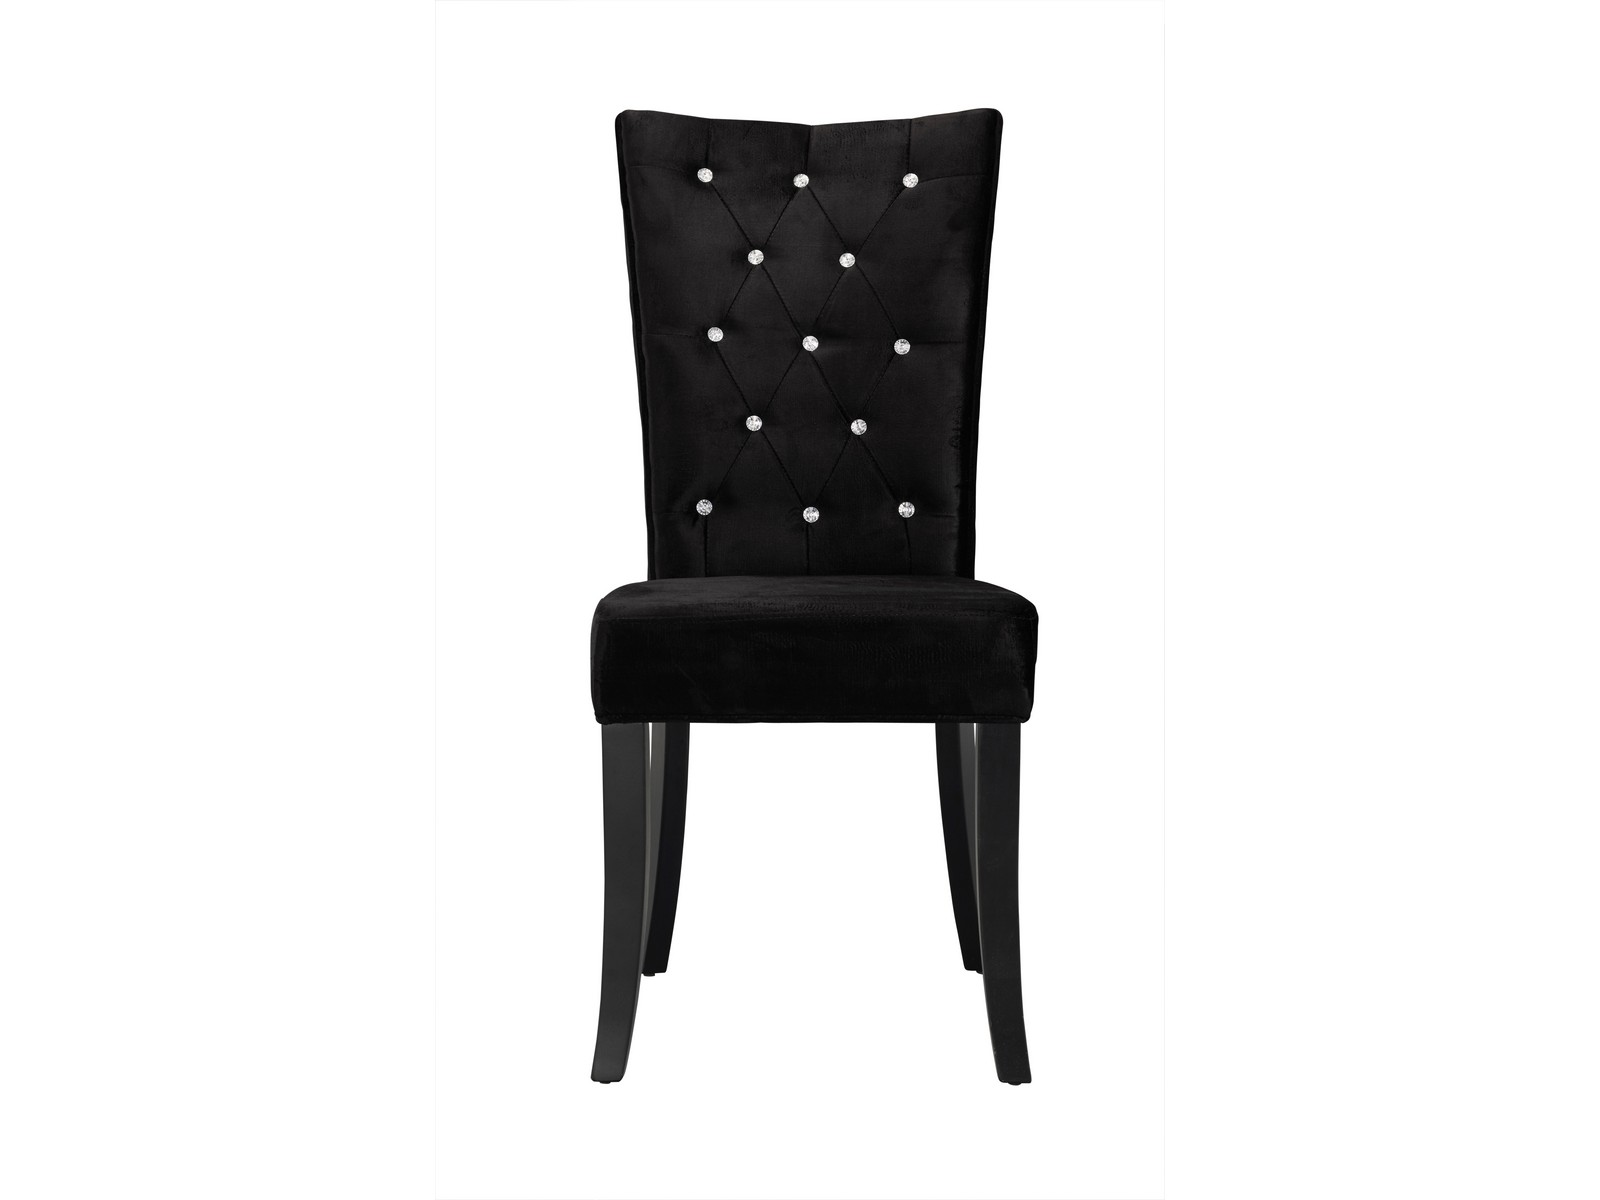 Radiance Velvet Dining Chairs X 2 Black Purple Grey EBay